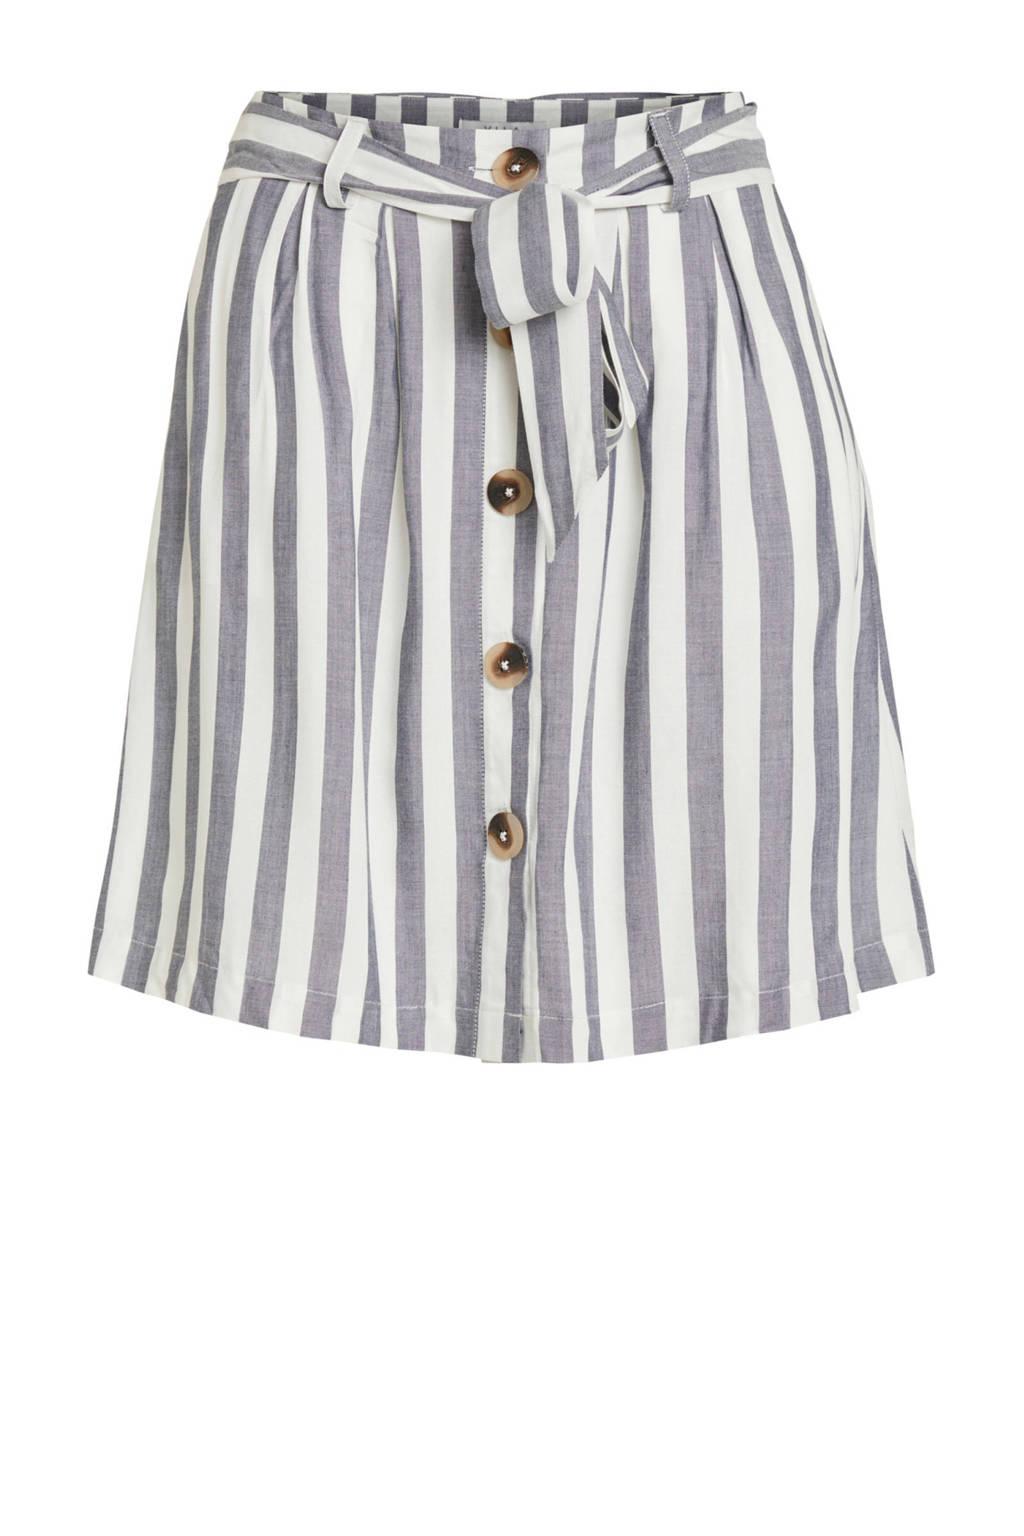 VILA gestreepte zomerse rok met strikceintuur, Wit/roze